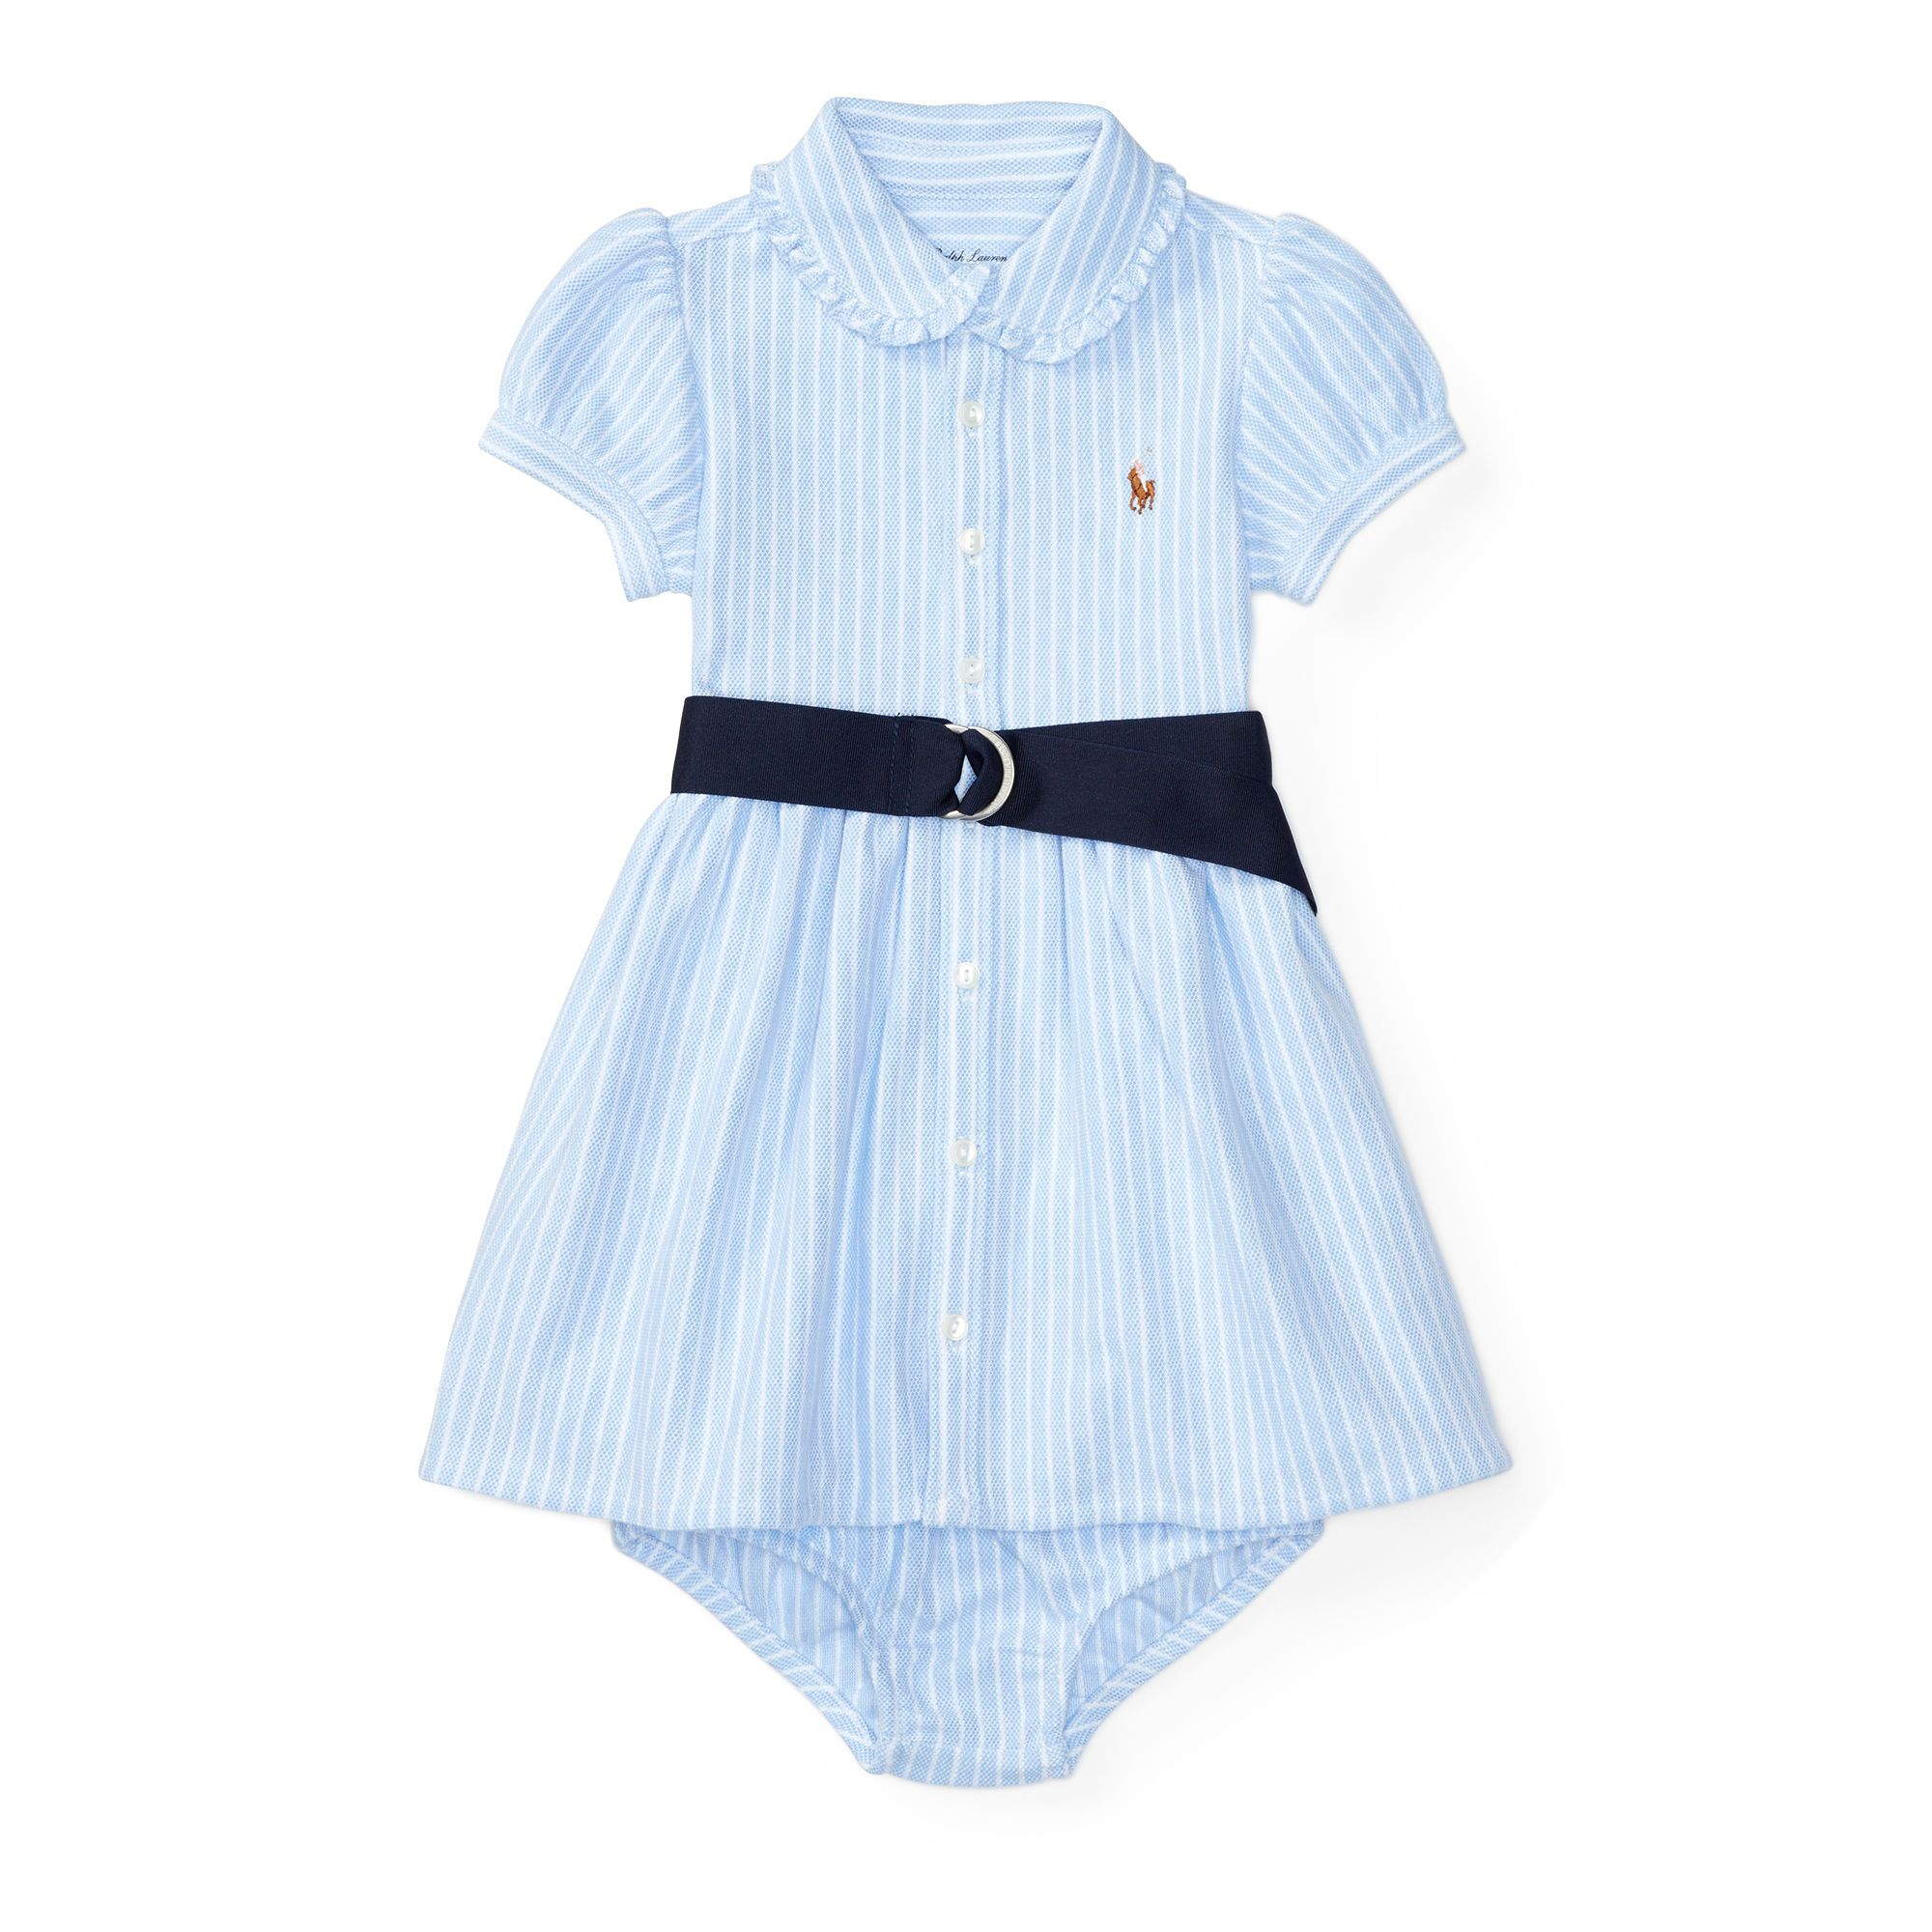 ab00e1d50eb Knit Oxford Dress   Bloomer